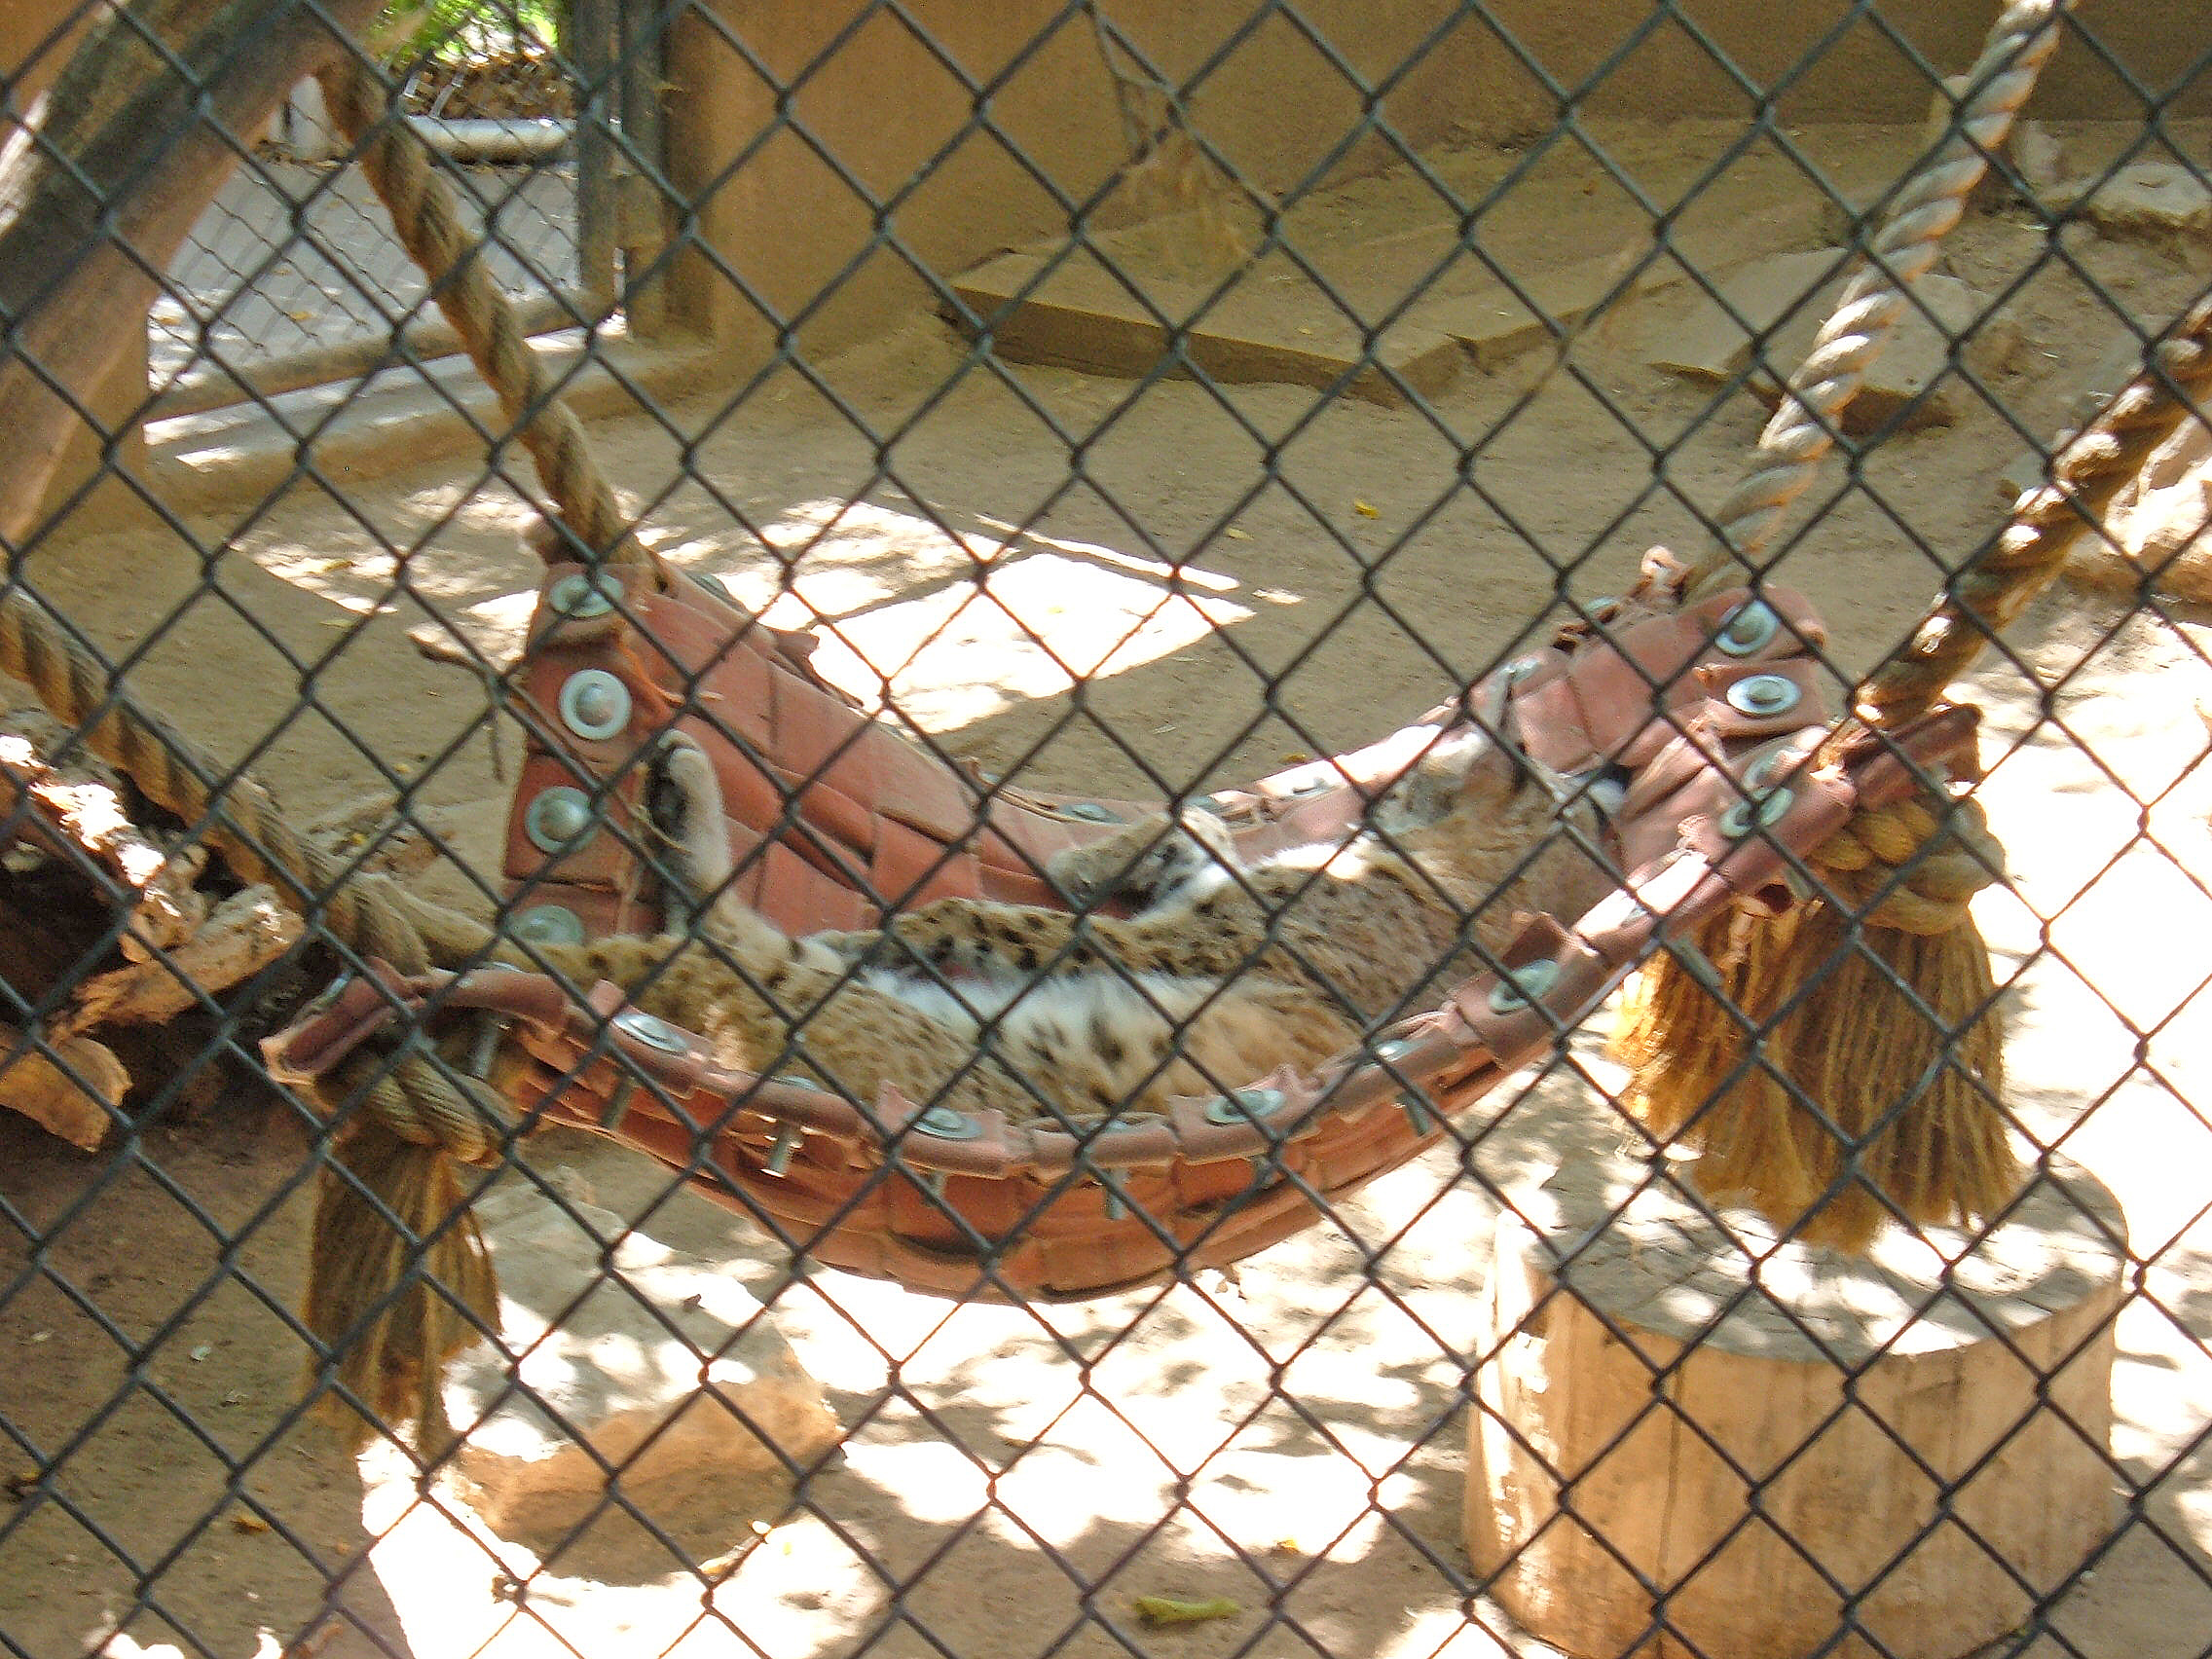 File Sleeping Bobcat In Hammock Rio Grande Zoo